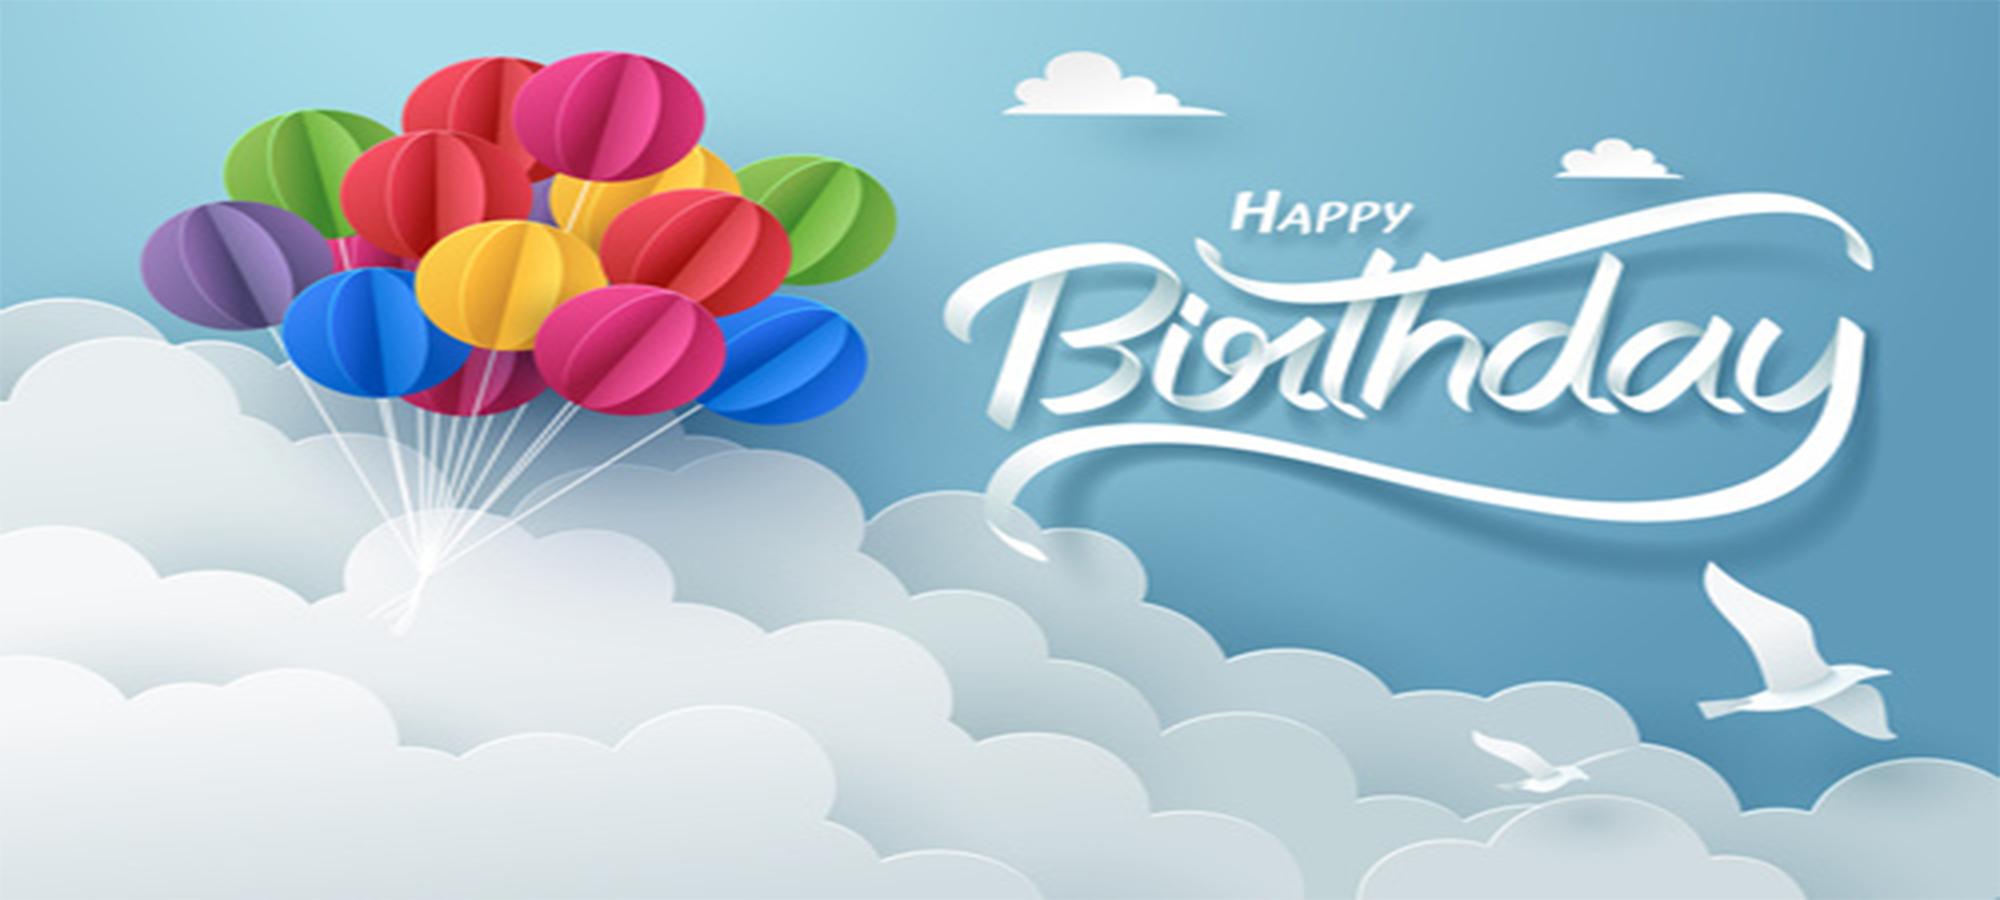 happy_birthday_266657337_larger